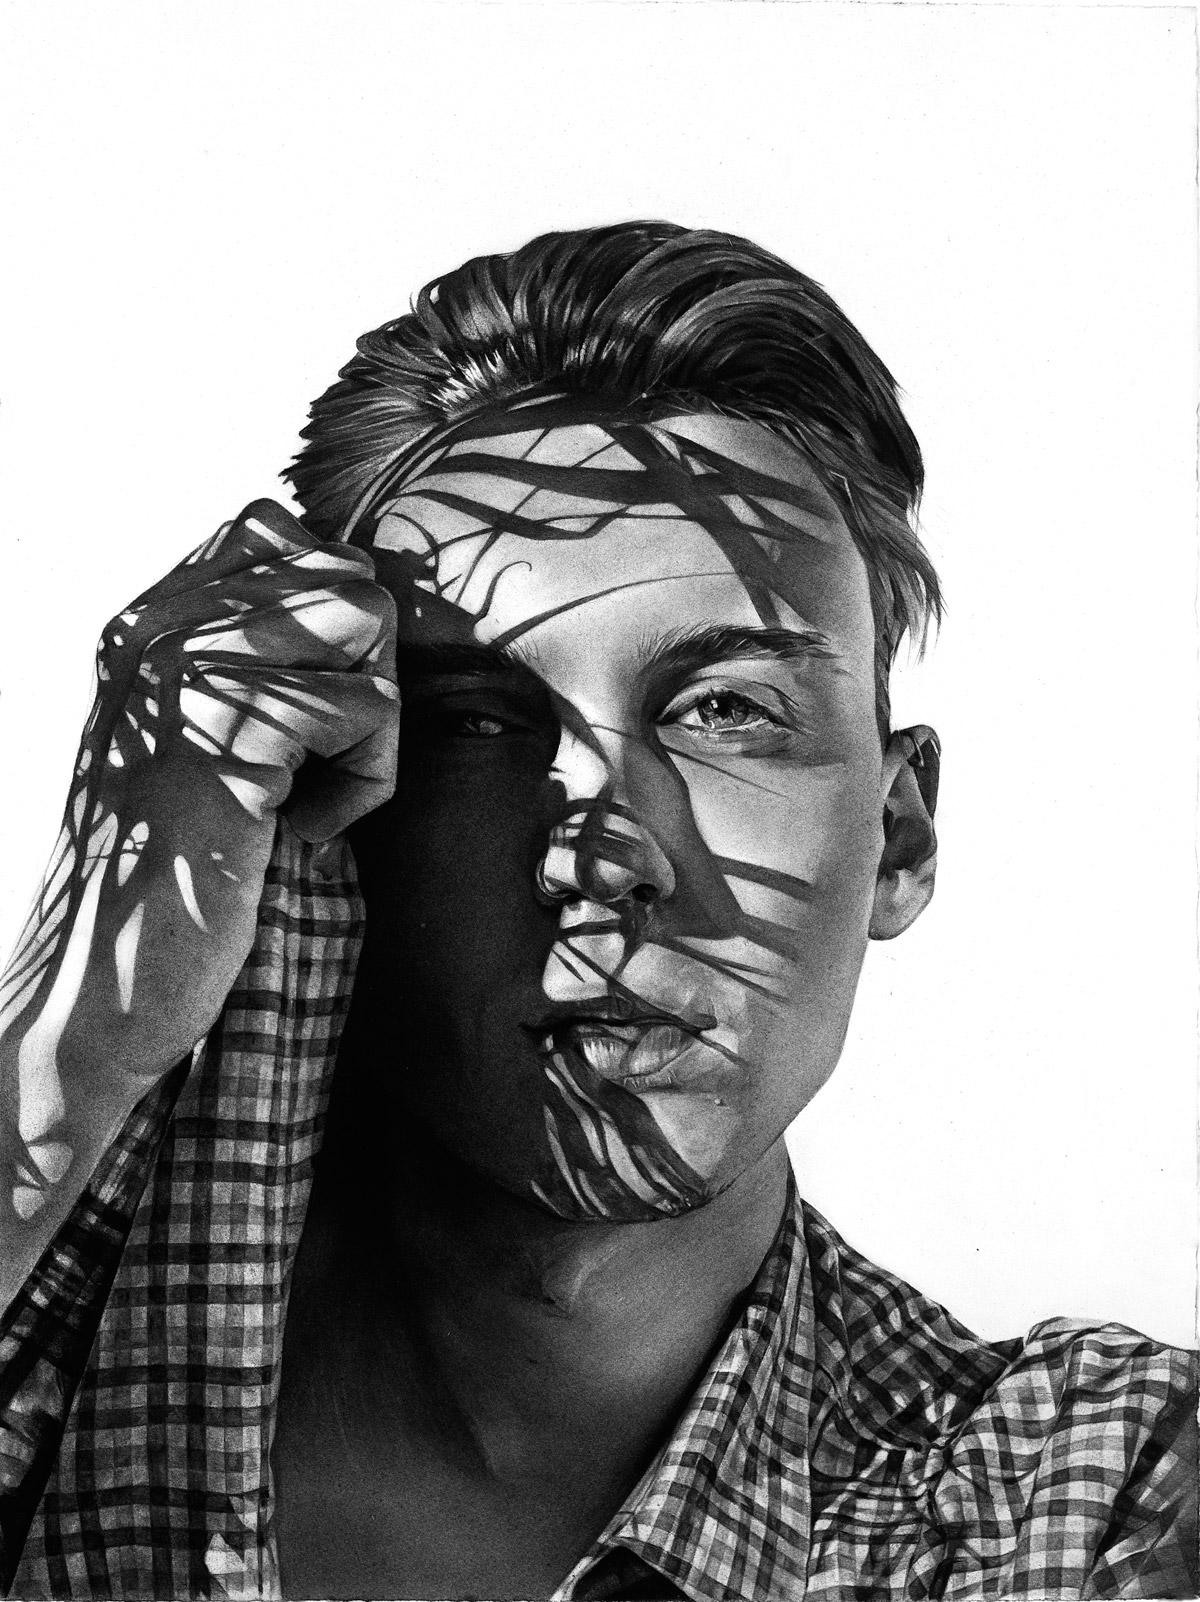 Dylan Andrews